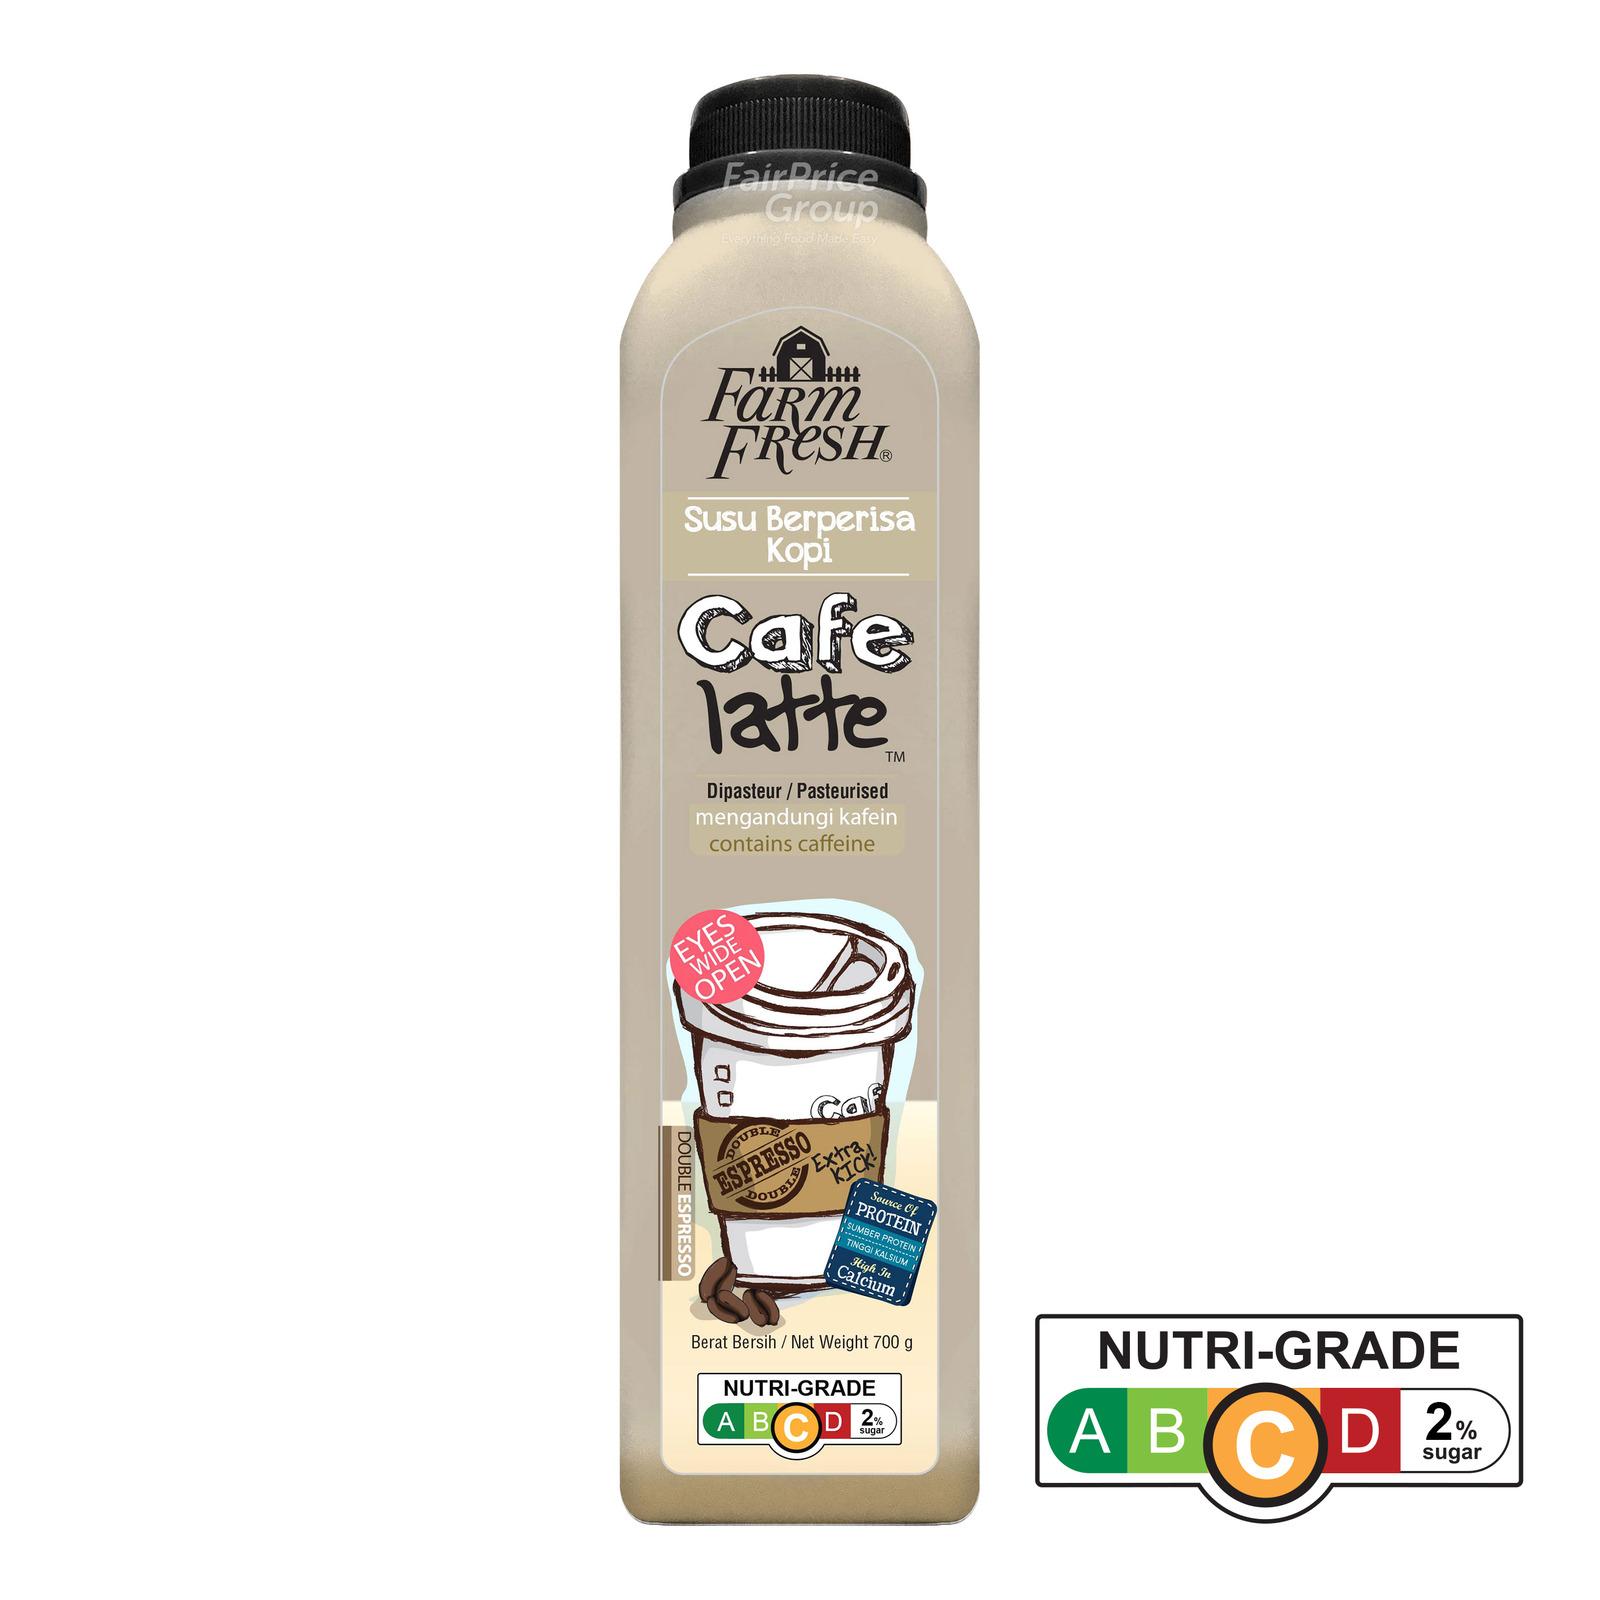 Farm Fresh Cafe Latte Bottle Drink